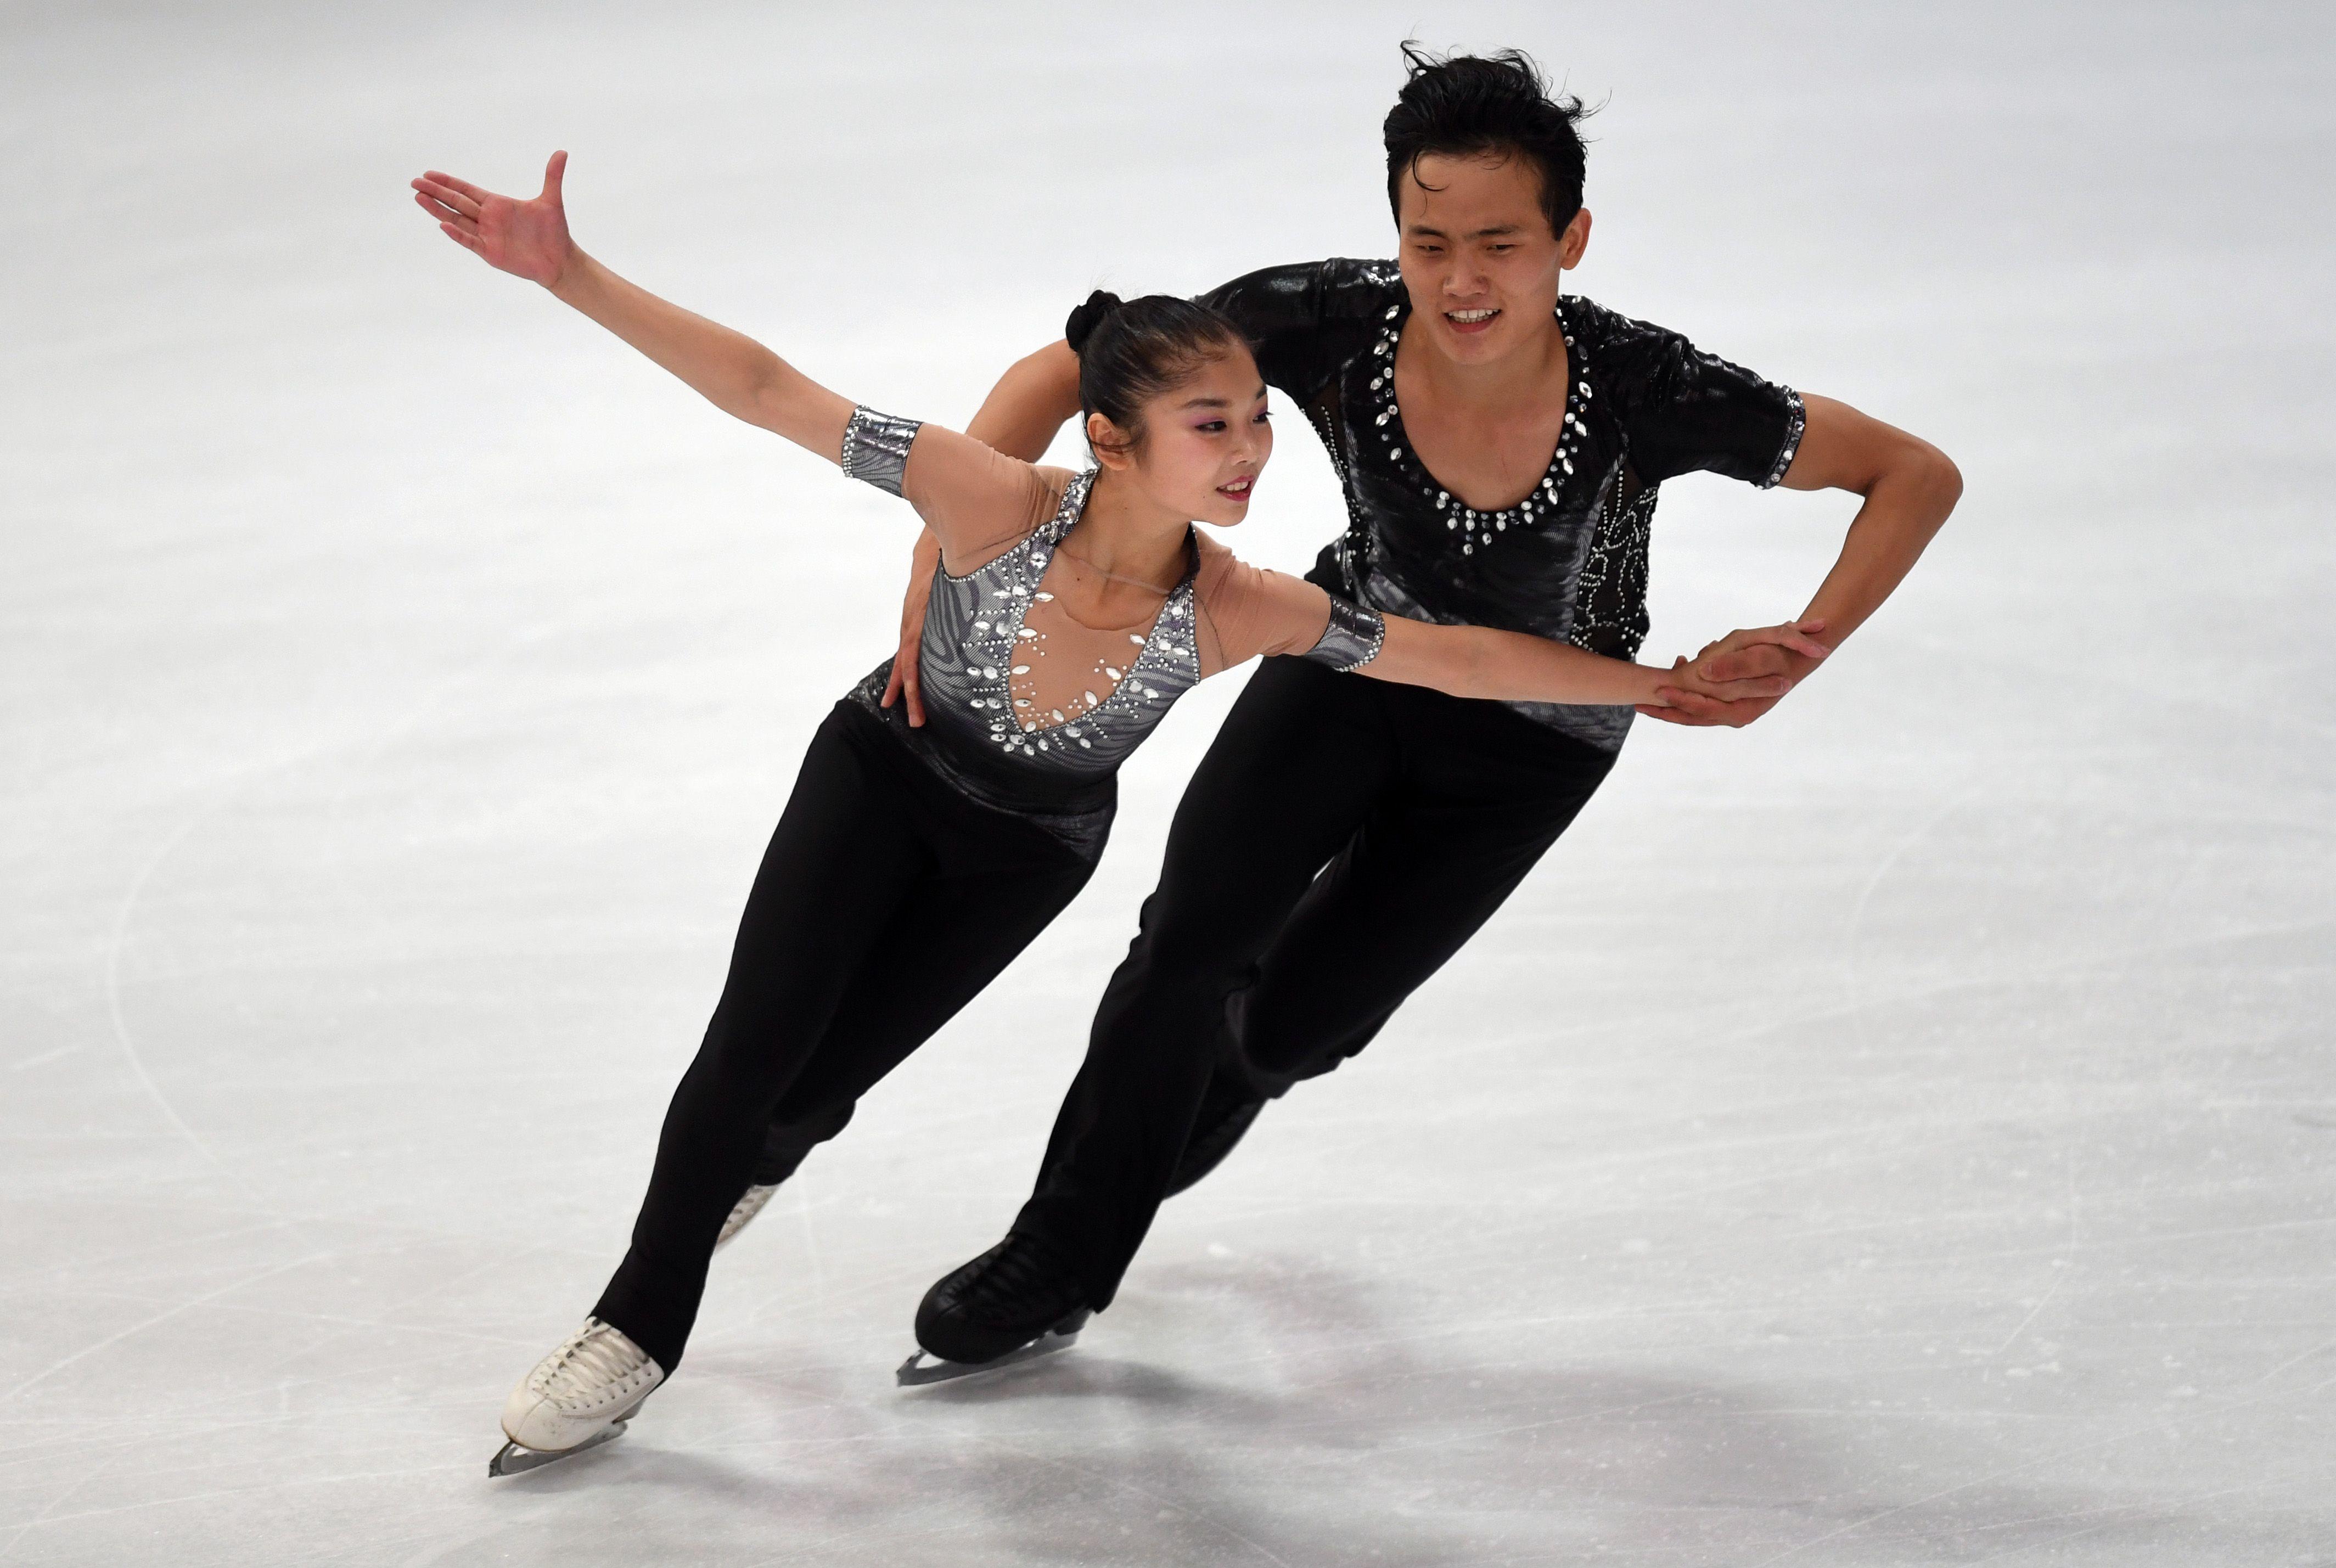 N. Korean Figure Skating Pair Qualifies for PyeongChang 2018